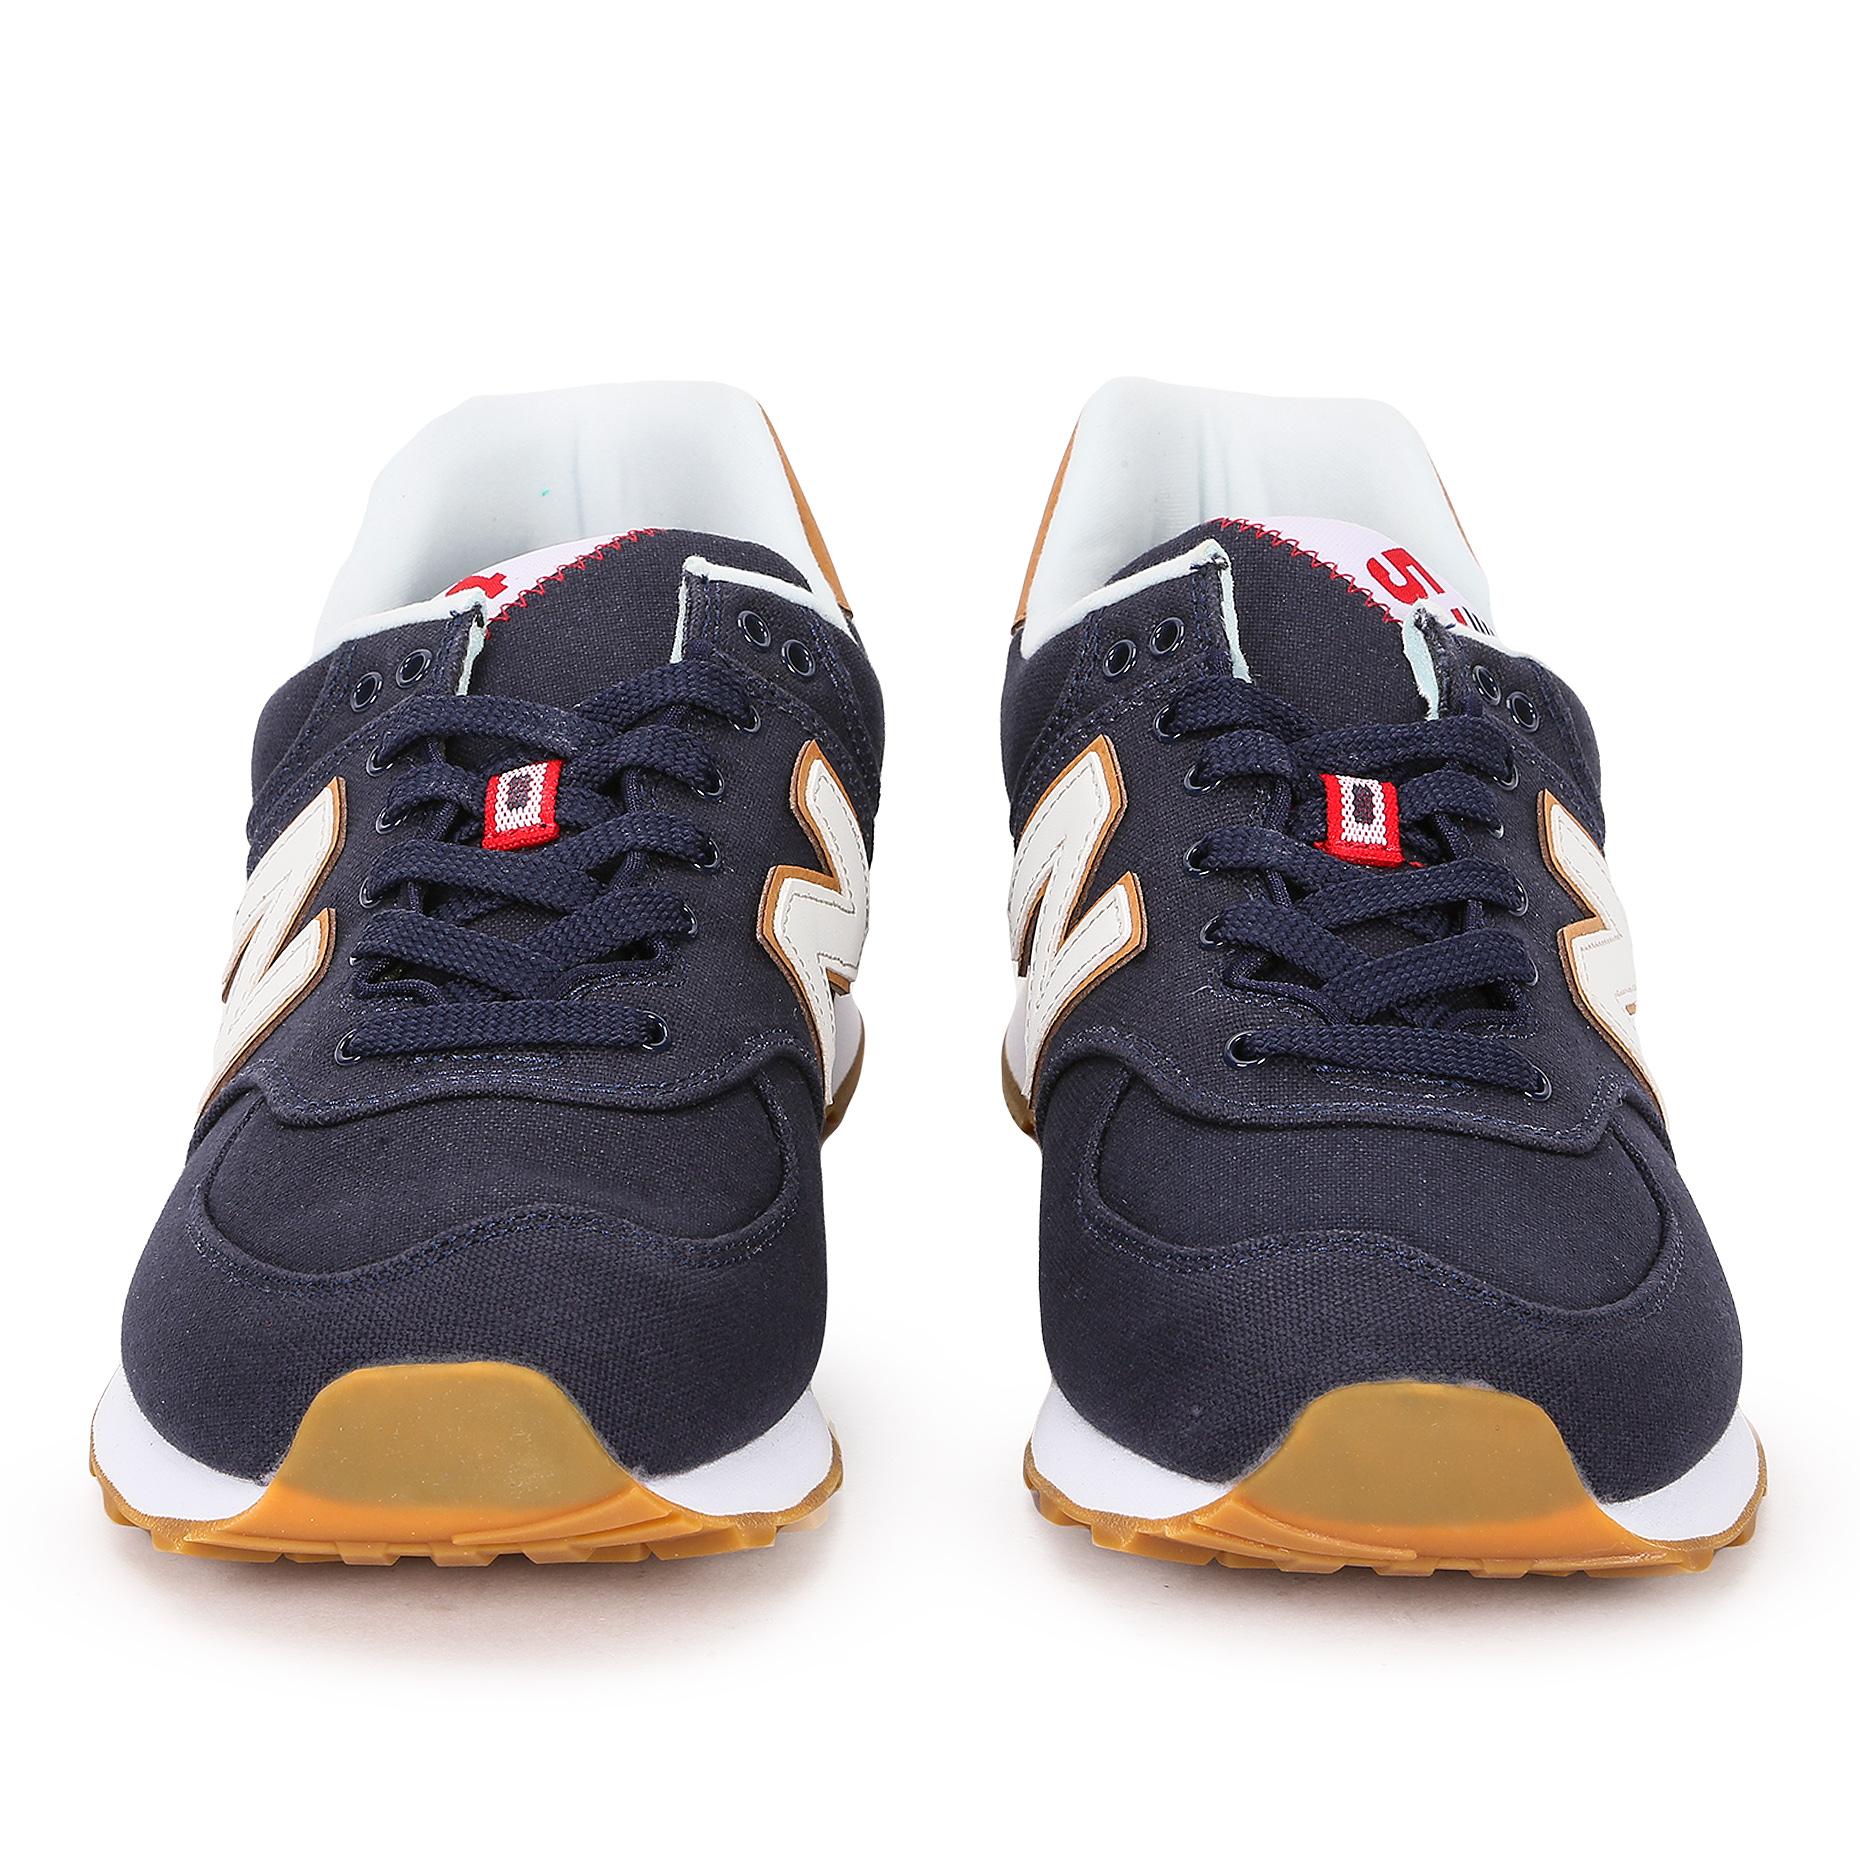 best sneakers e51de 127ab Кроссовки 574 от New Balance (ML574YLC/D) - продажа, цена ...